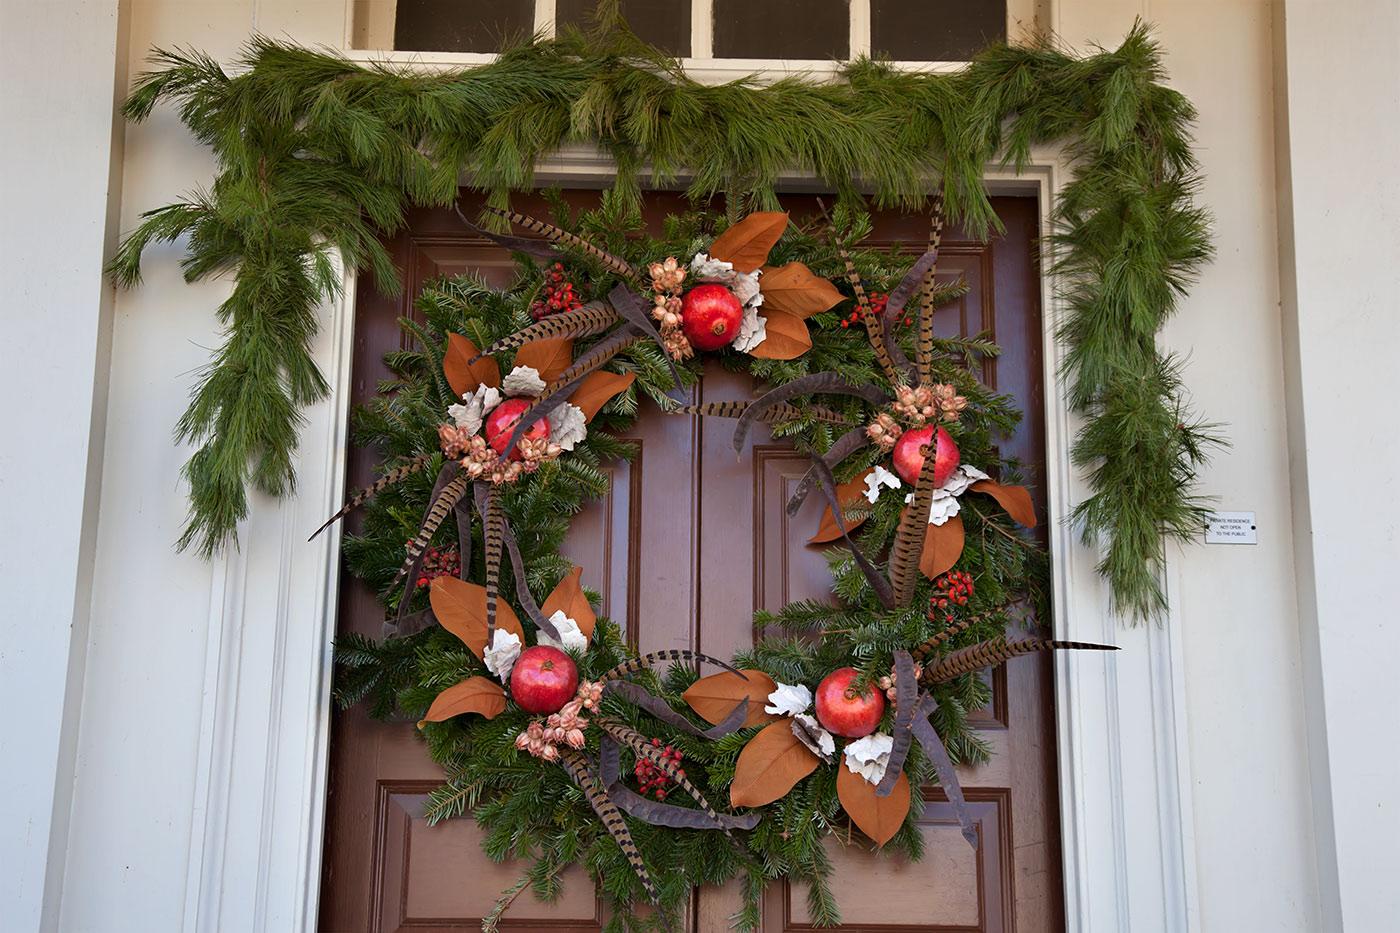 Colonial Williamsburg Christmas.Colonial Williamsburg Holiday Wreaths Janice Hathaway